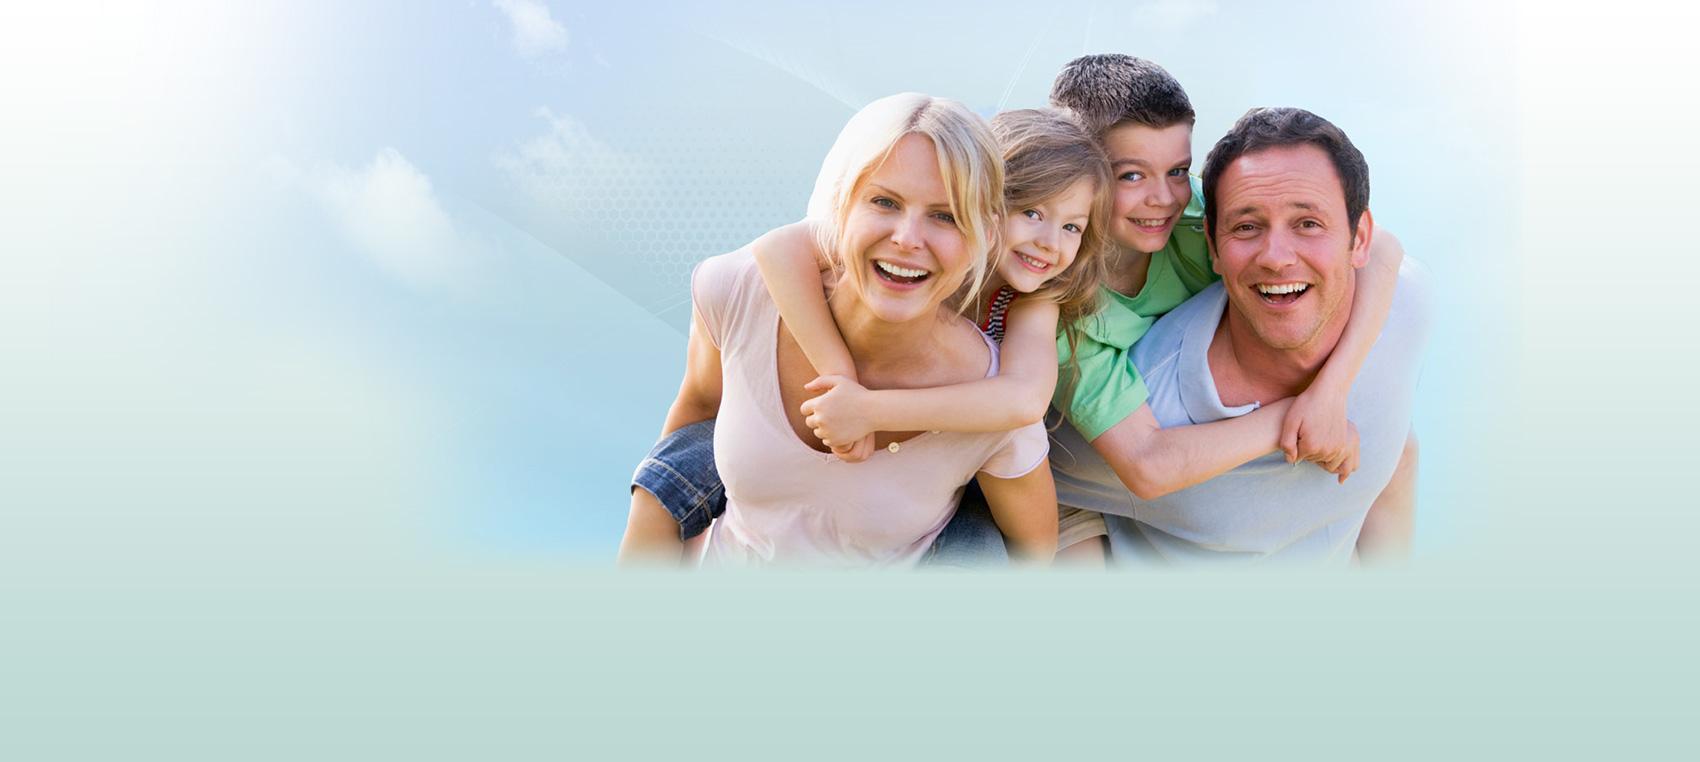 family posing together Dental Care Center